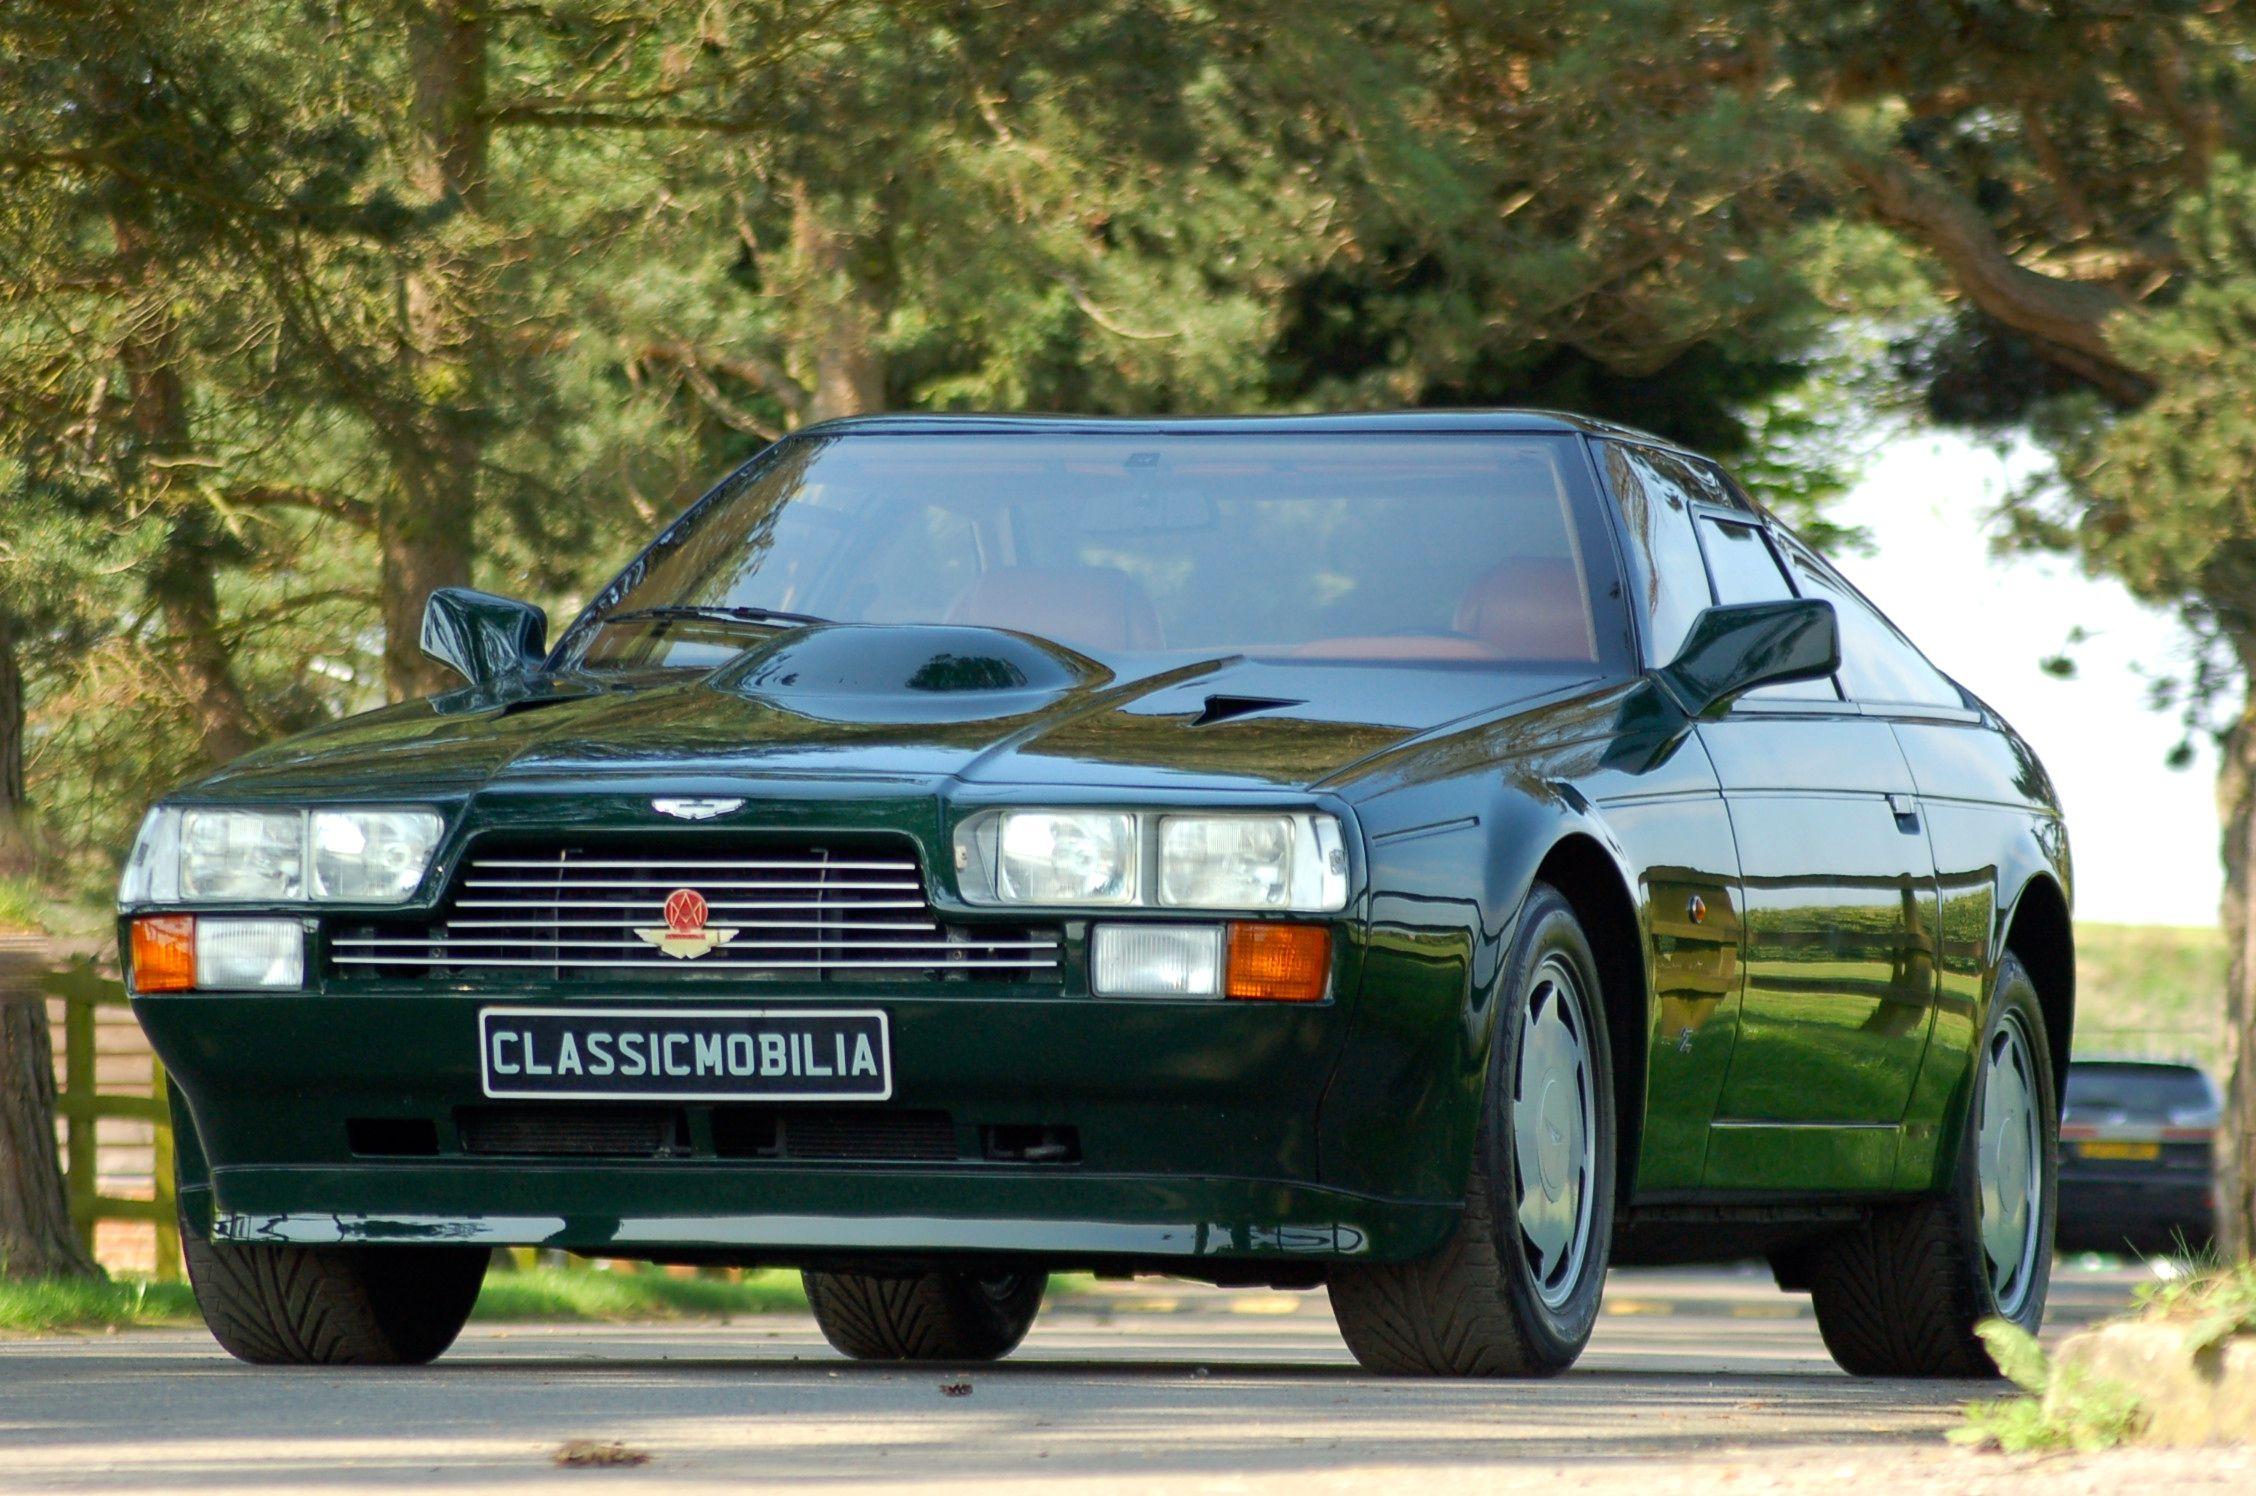 Aston Martin V8 Vantage Zagato Coupe left hand drive with great